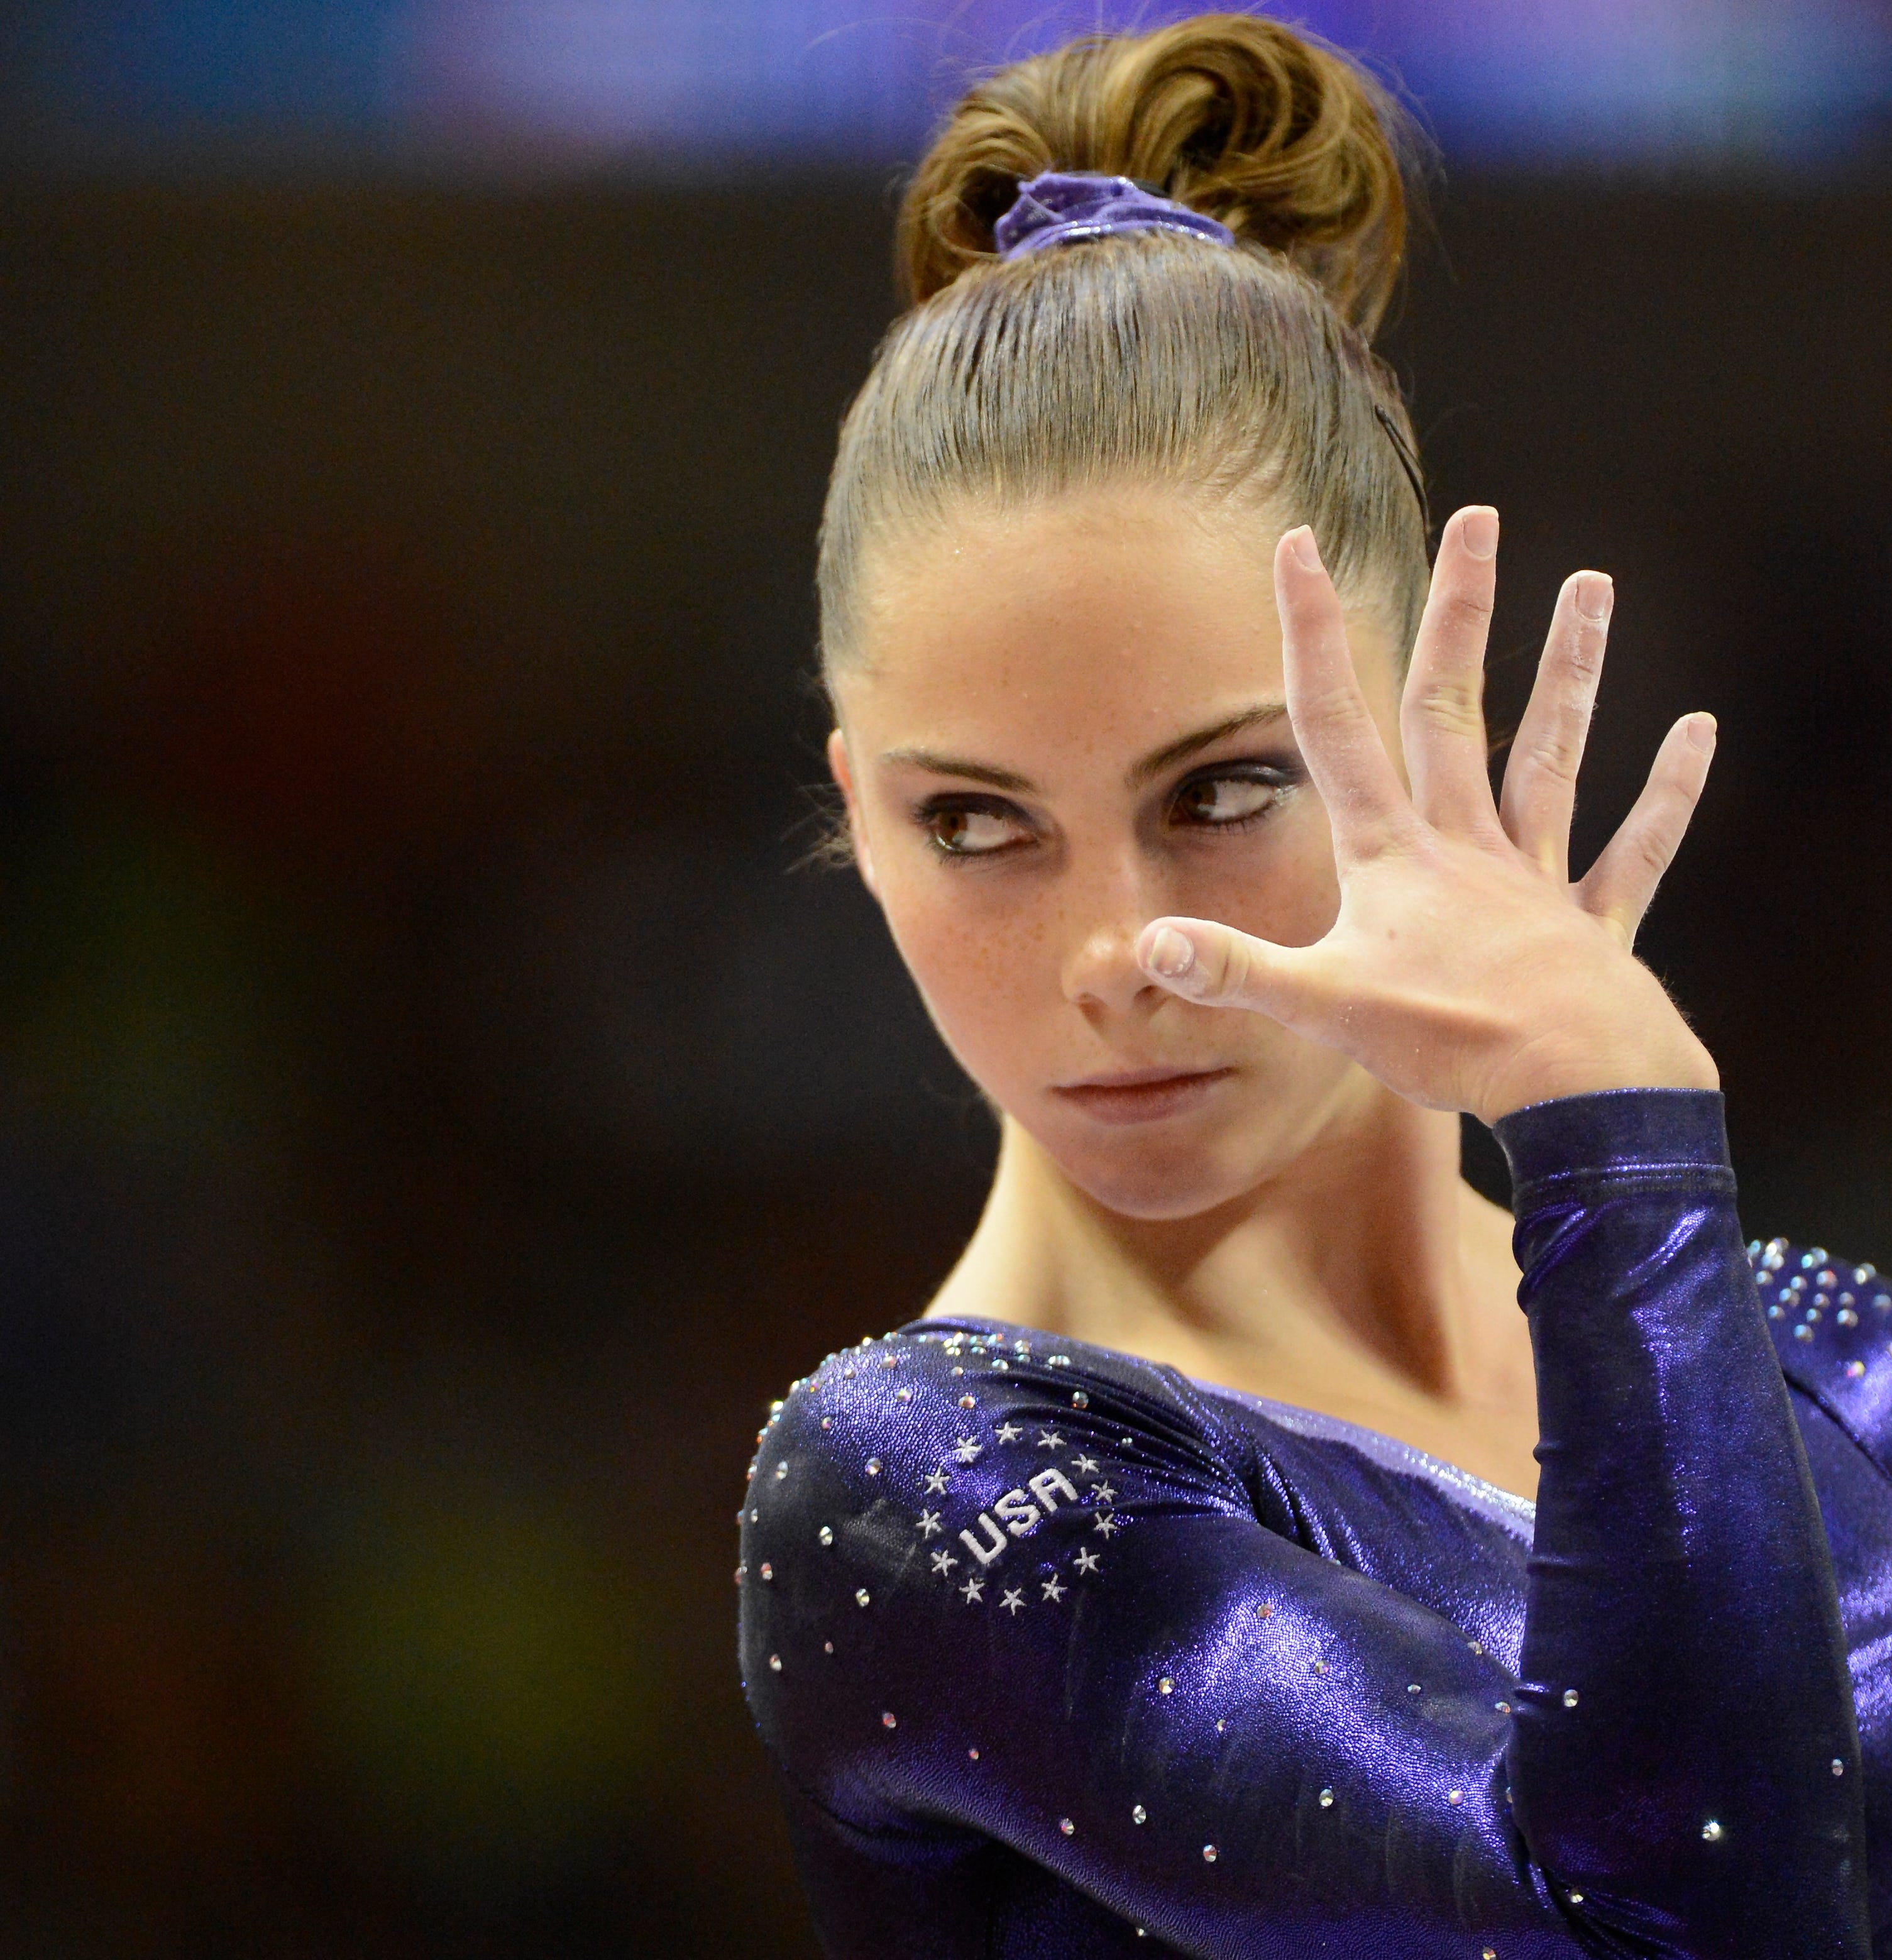 Showing Media Posts For Gymnast Xxx